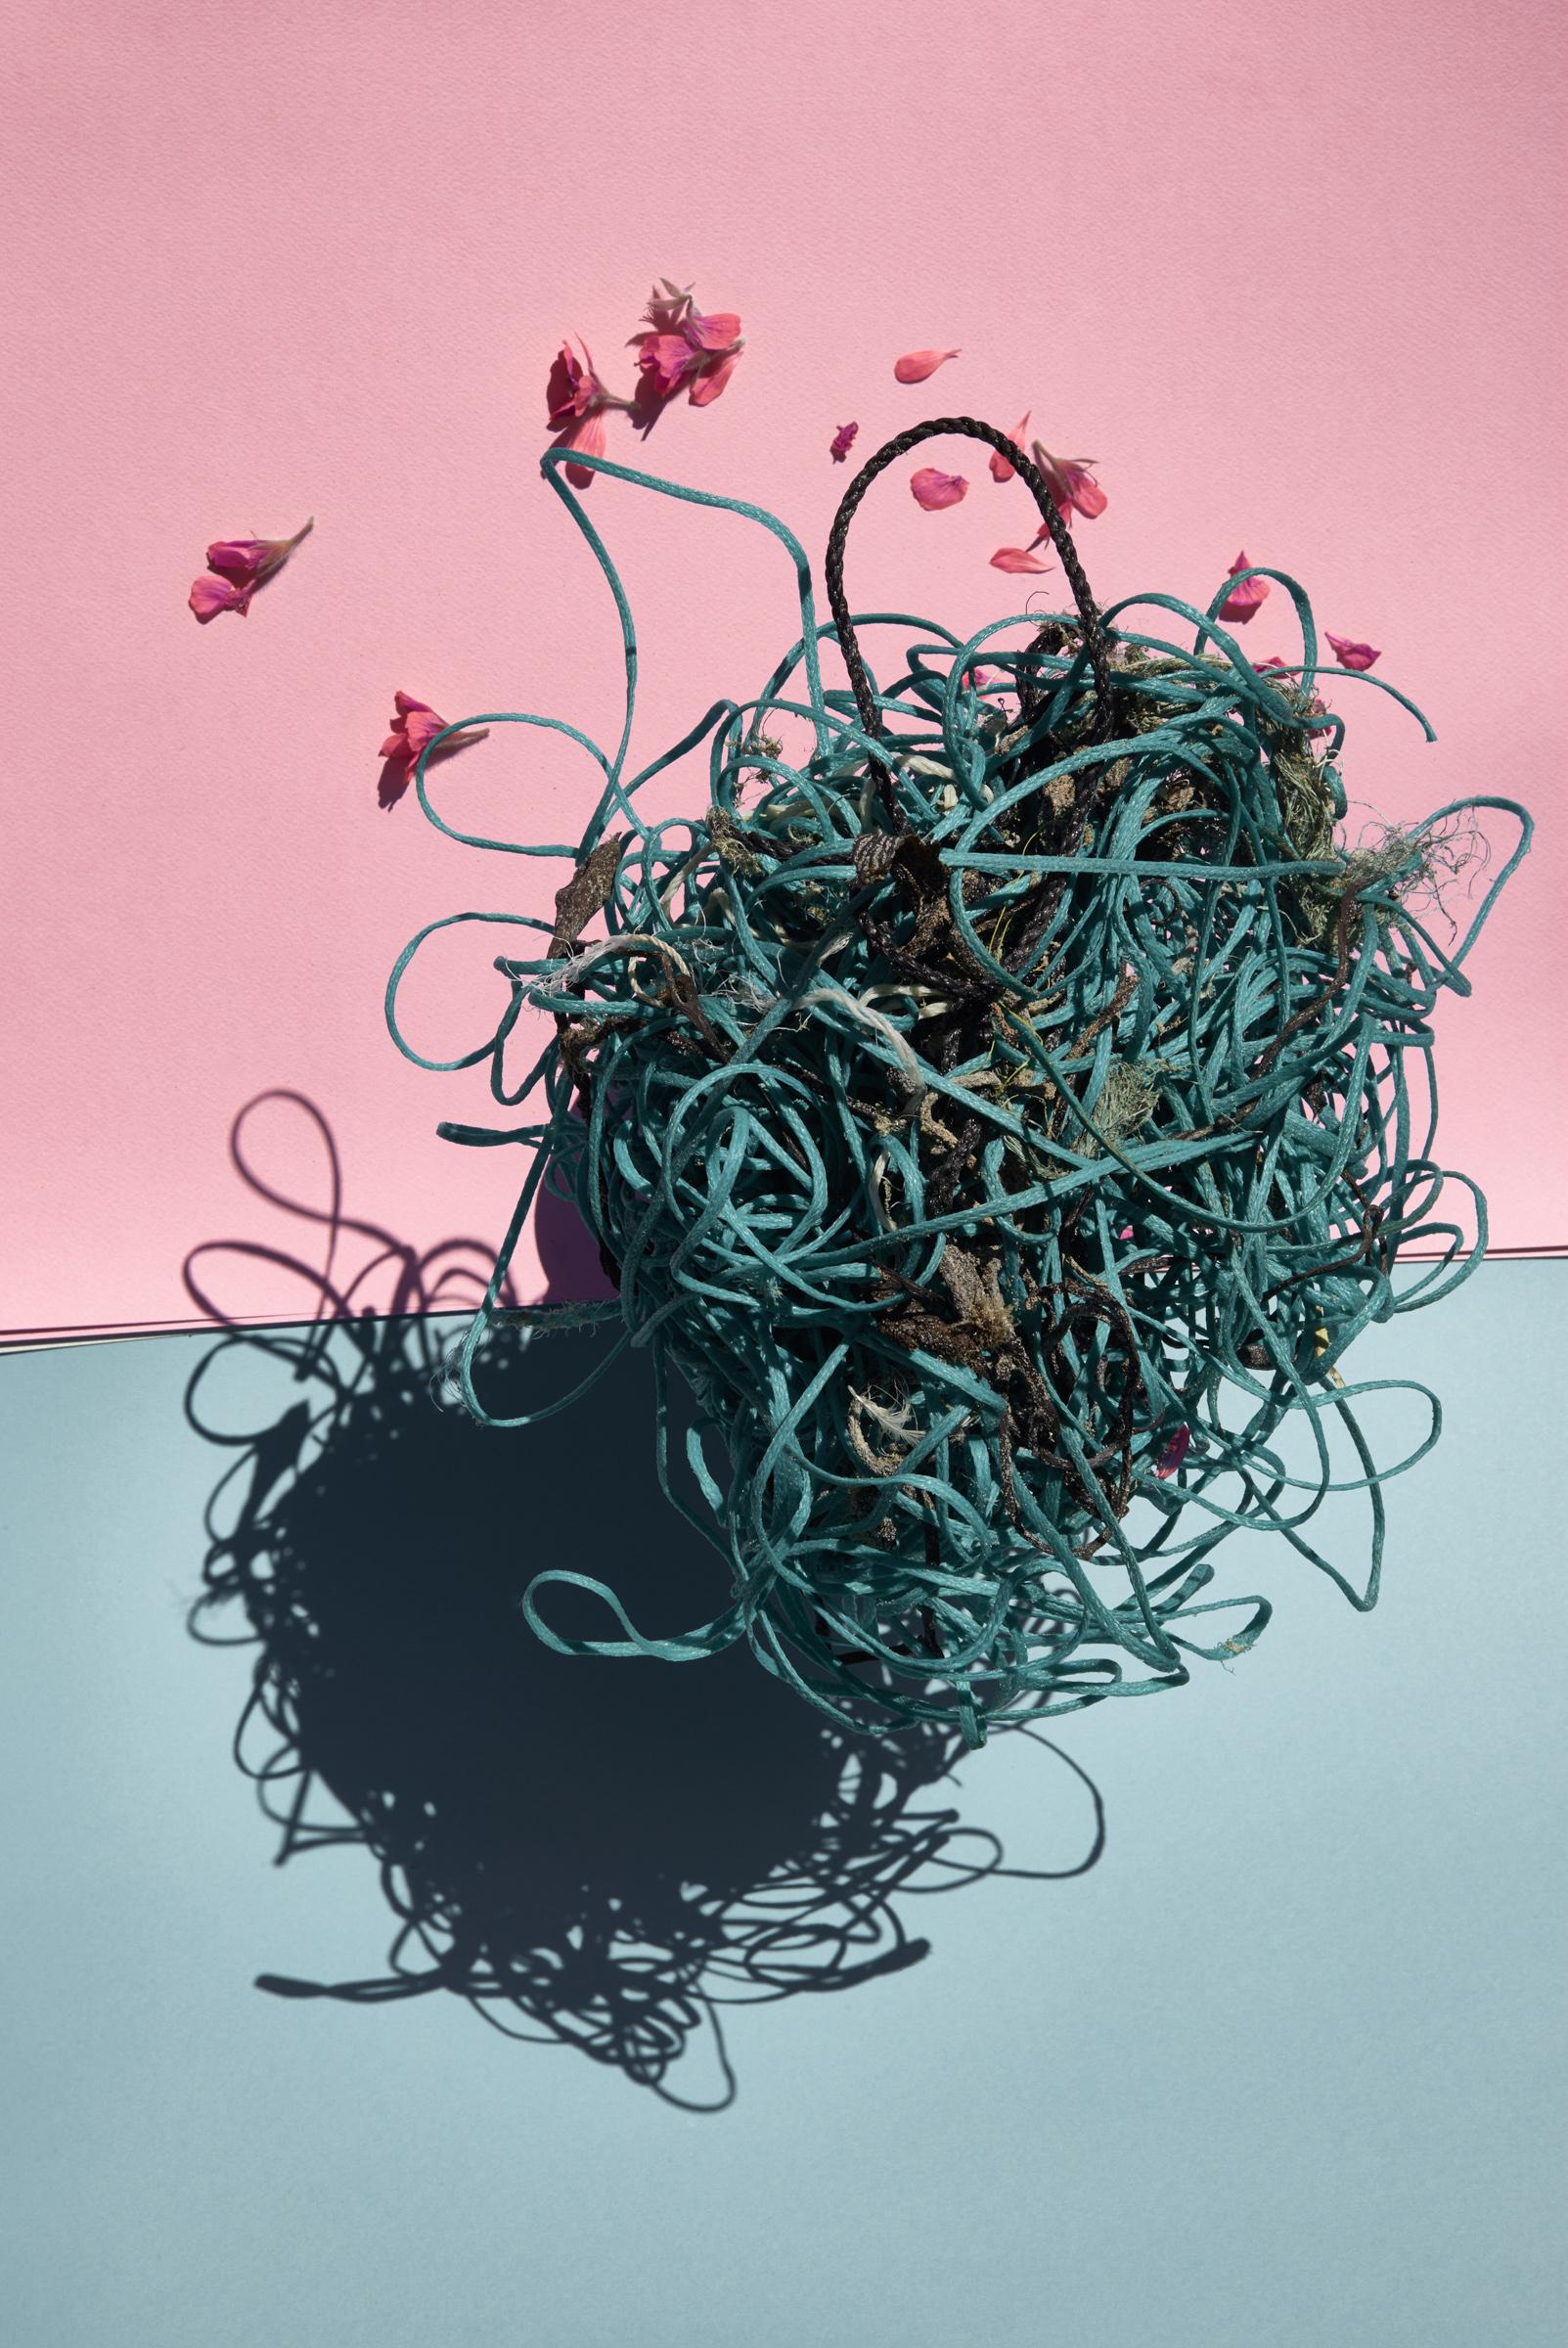 Thirza Schaap, beehive, 2017. Courtesy of the artist and Bildhalle Zürich + Amsterdam